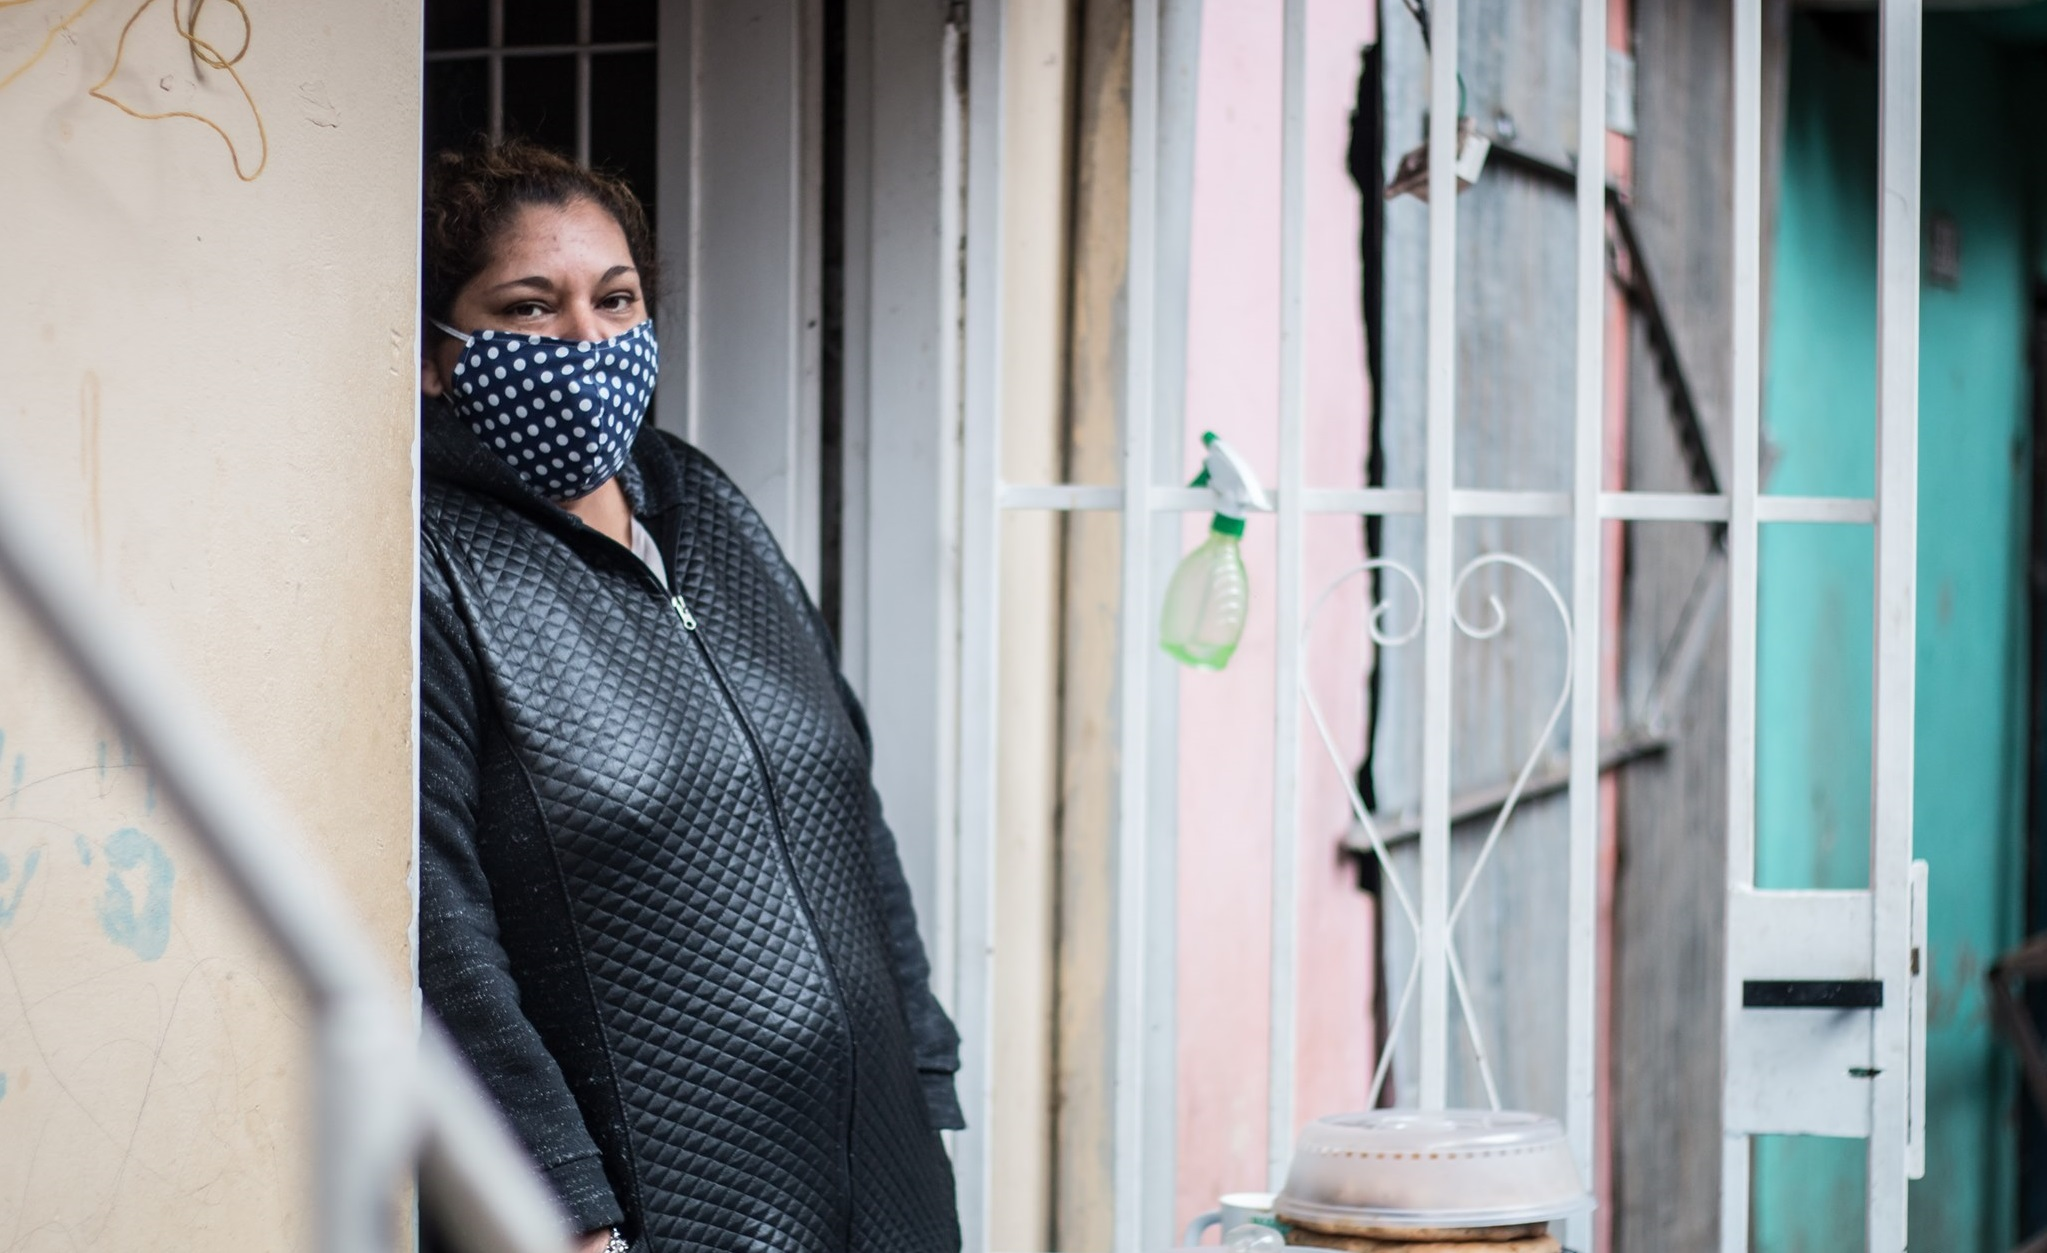 Murió Ramona Medina por Coronavirus, vecina de la Villa 31 y vocera de La Poderosa